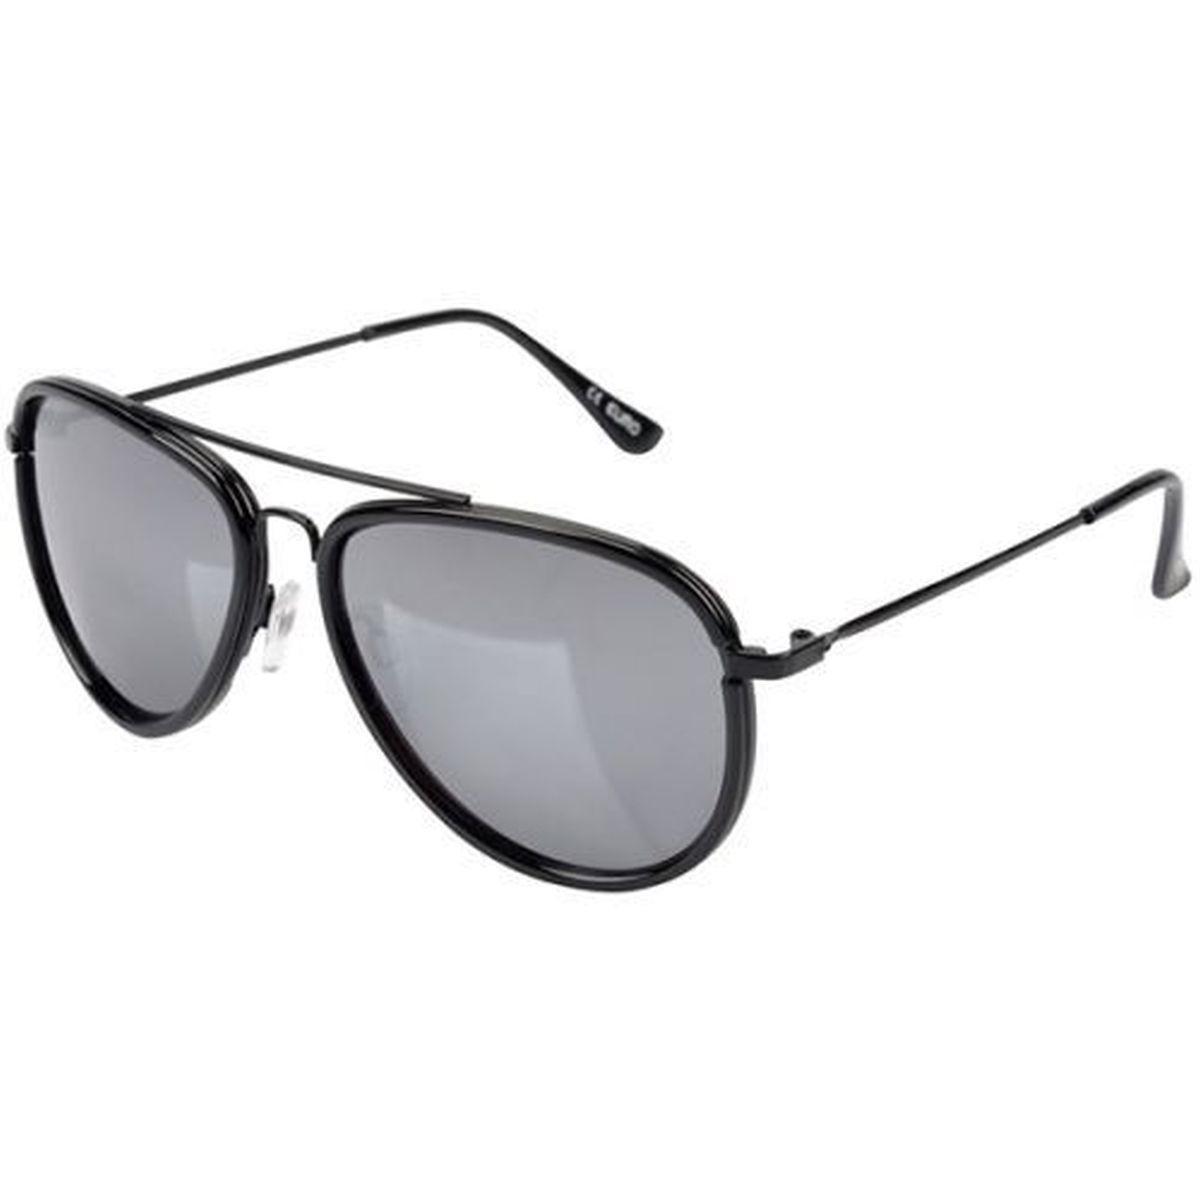 Oculos de Sol Euro Feminino Oc057eu 3p R  189,90 à vista. Adicionar à sacola 4c5b2f6b8b